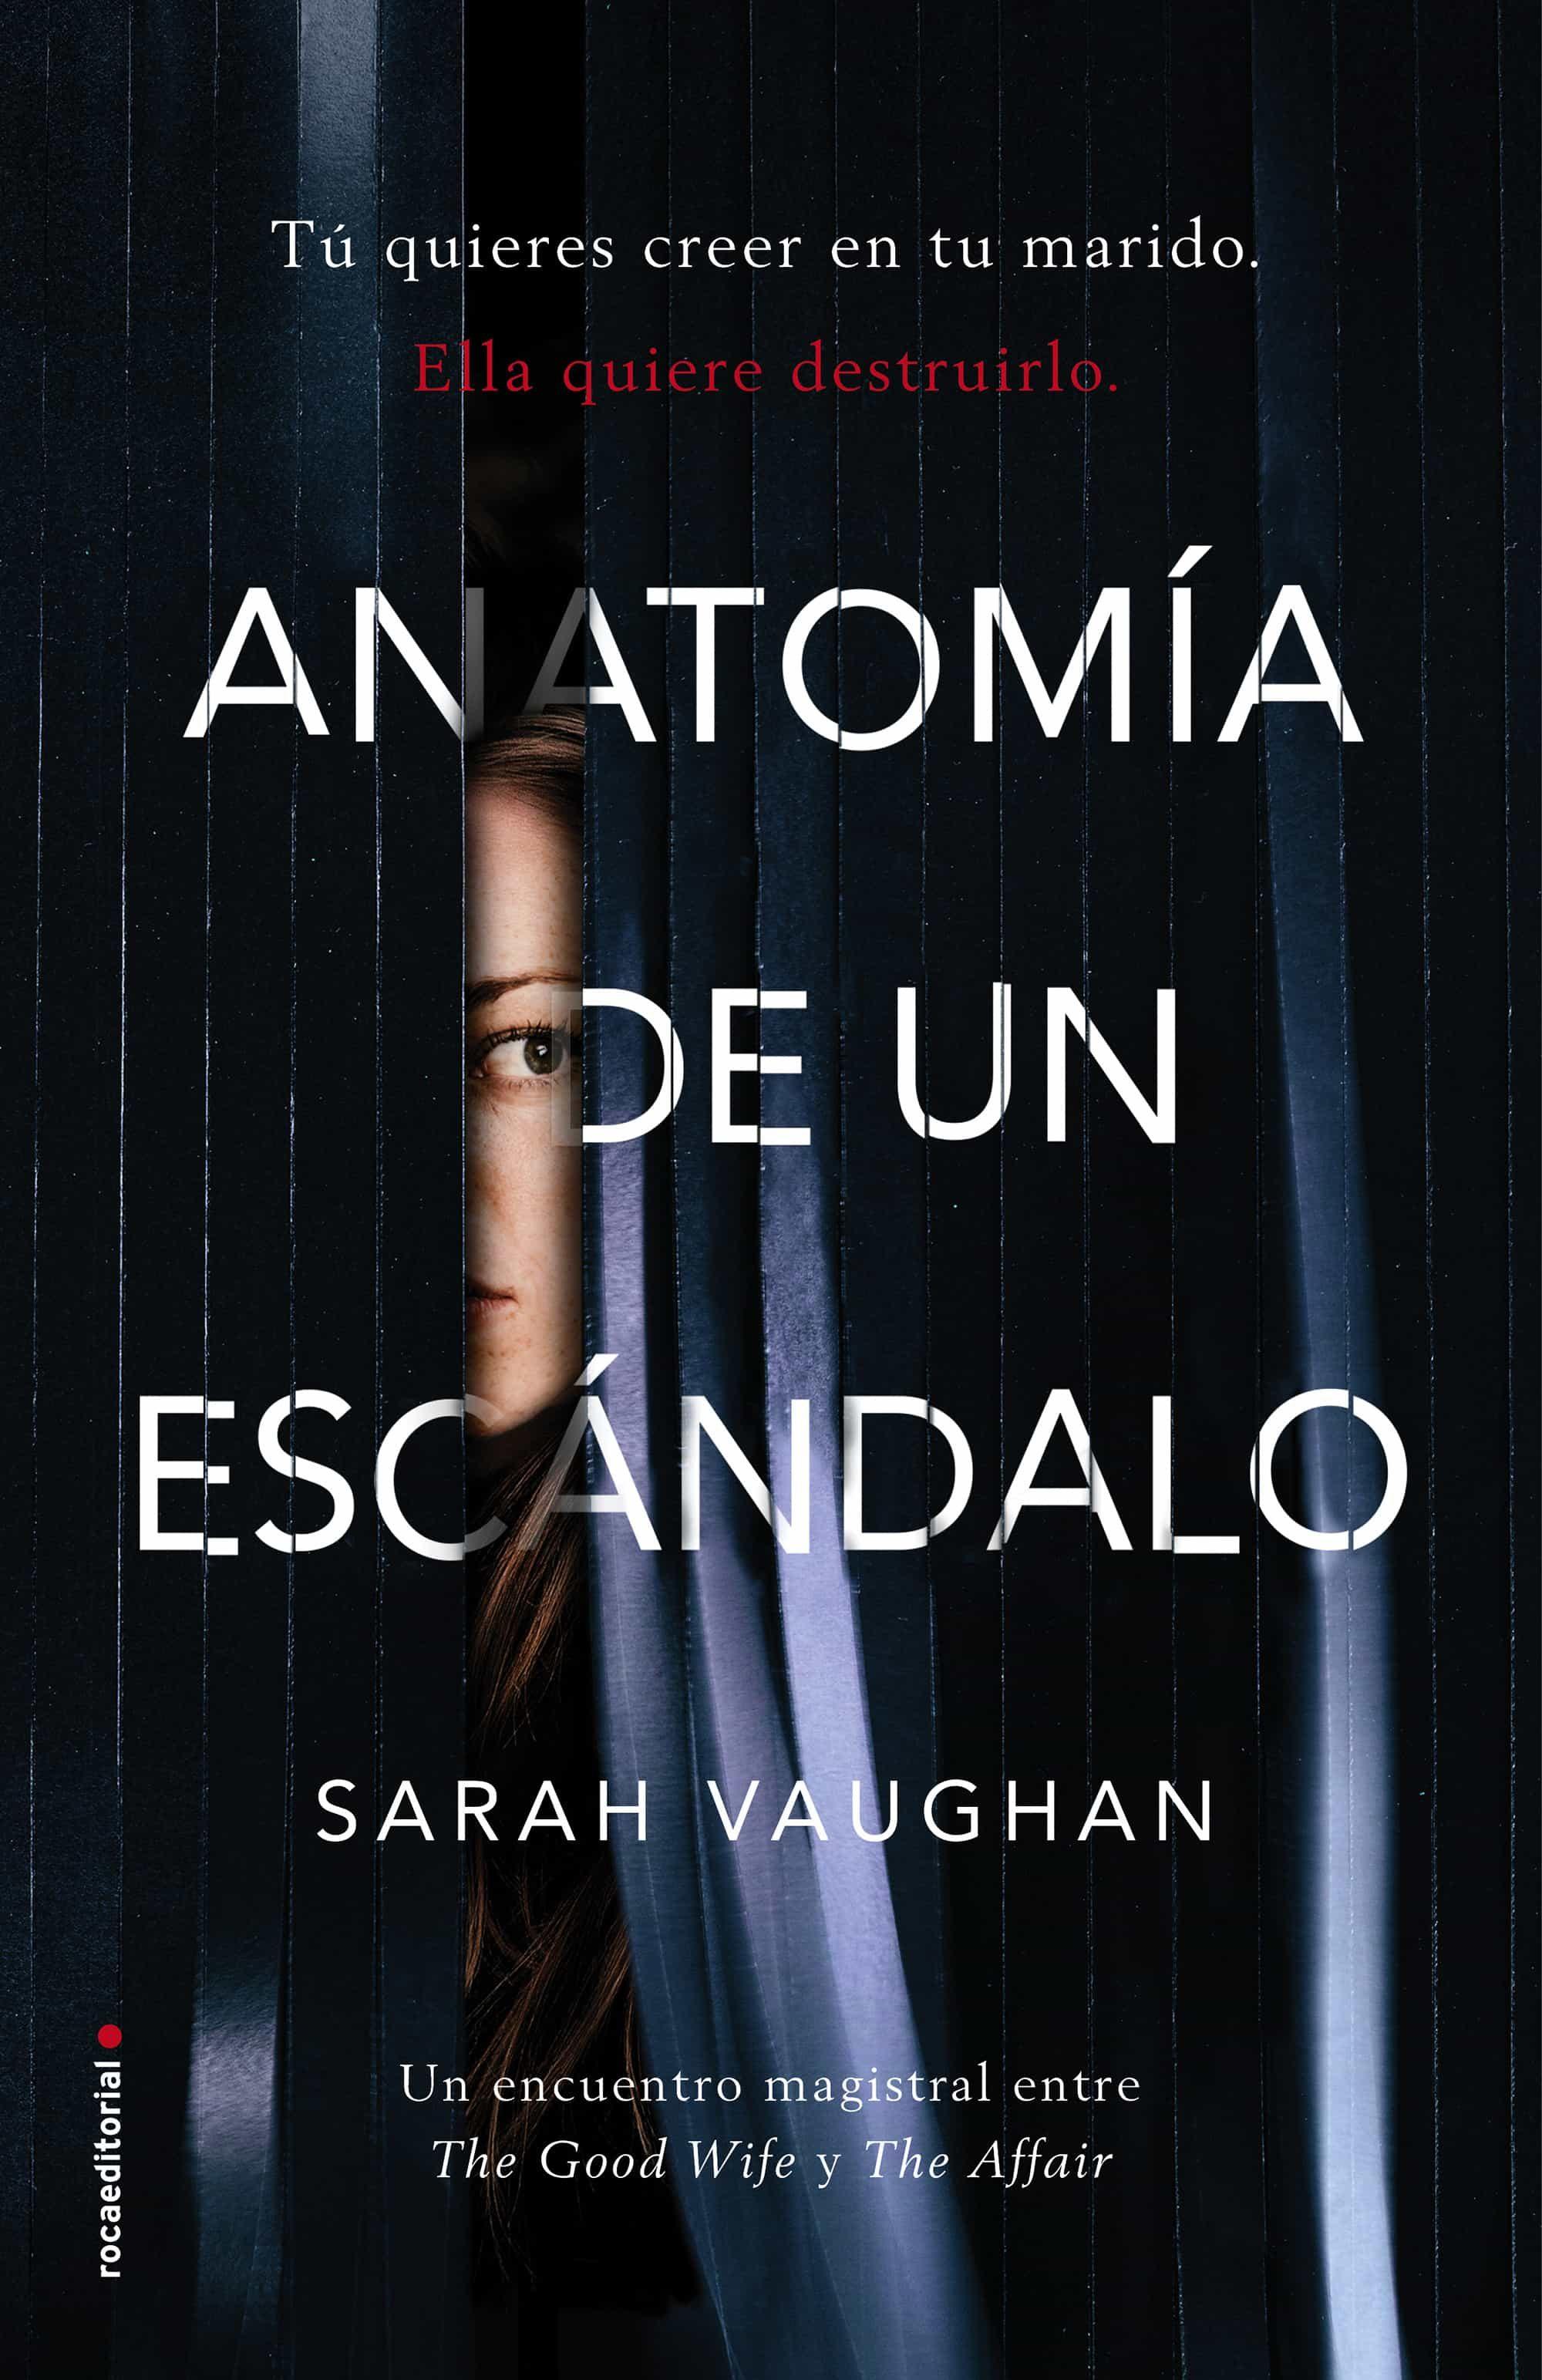 ANATOMÍA DE UN ESCÁNDALO | SARAH VAUGHAN | Comprar libro 9788416867905